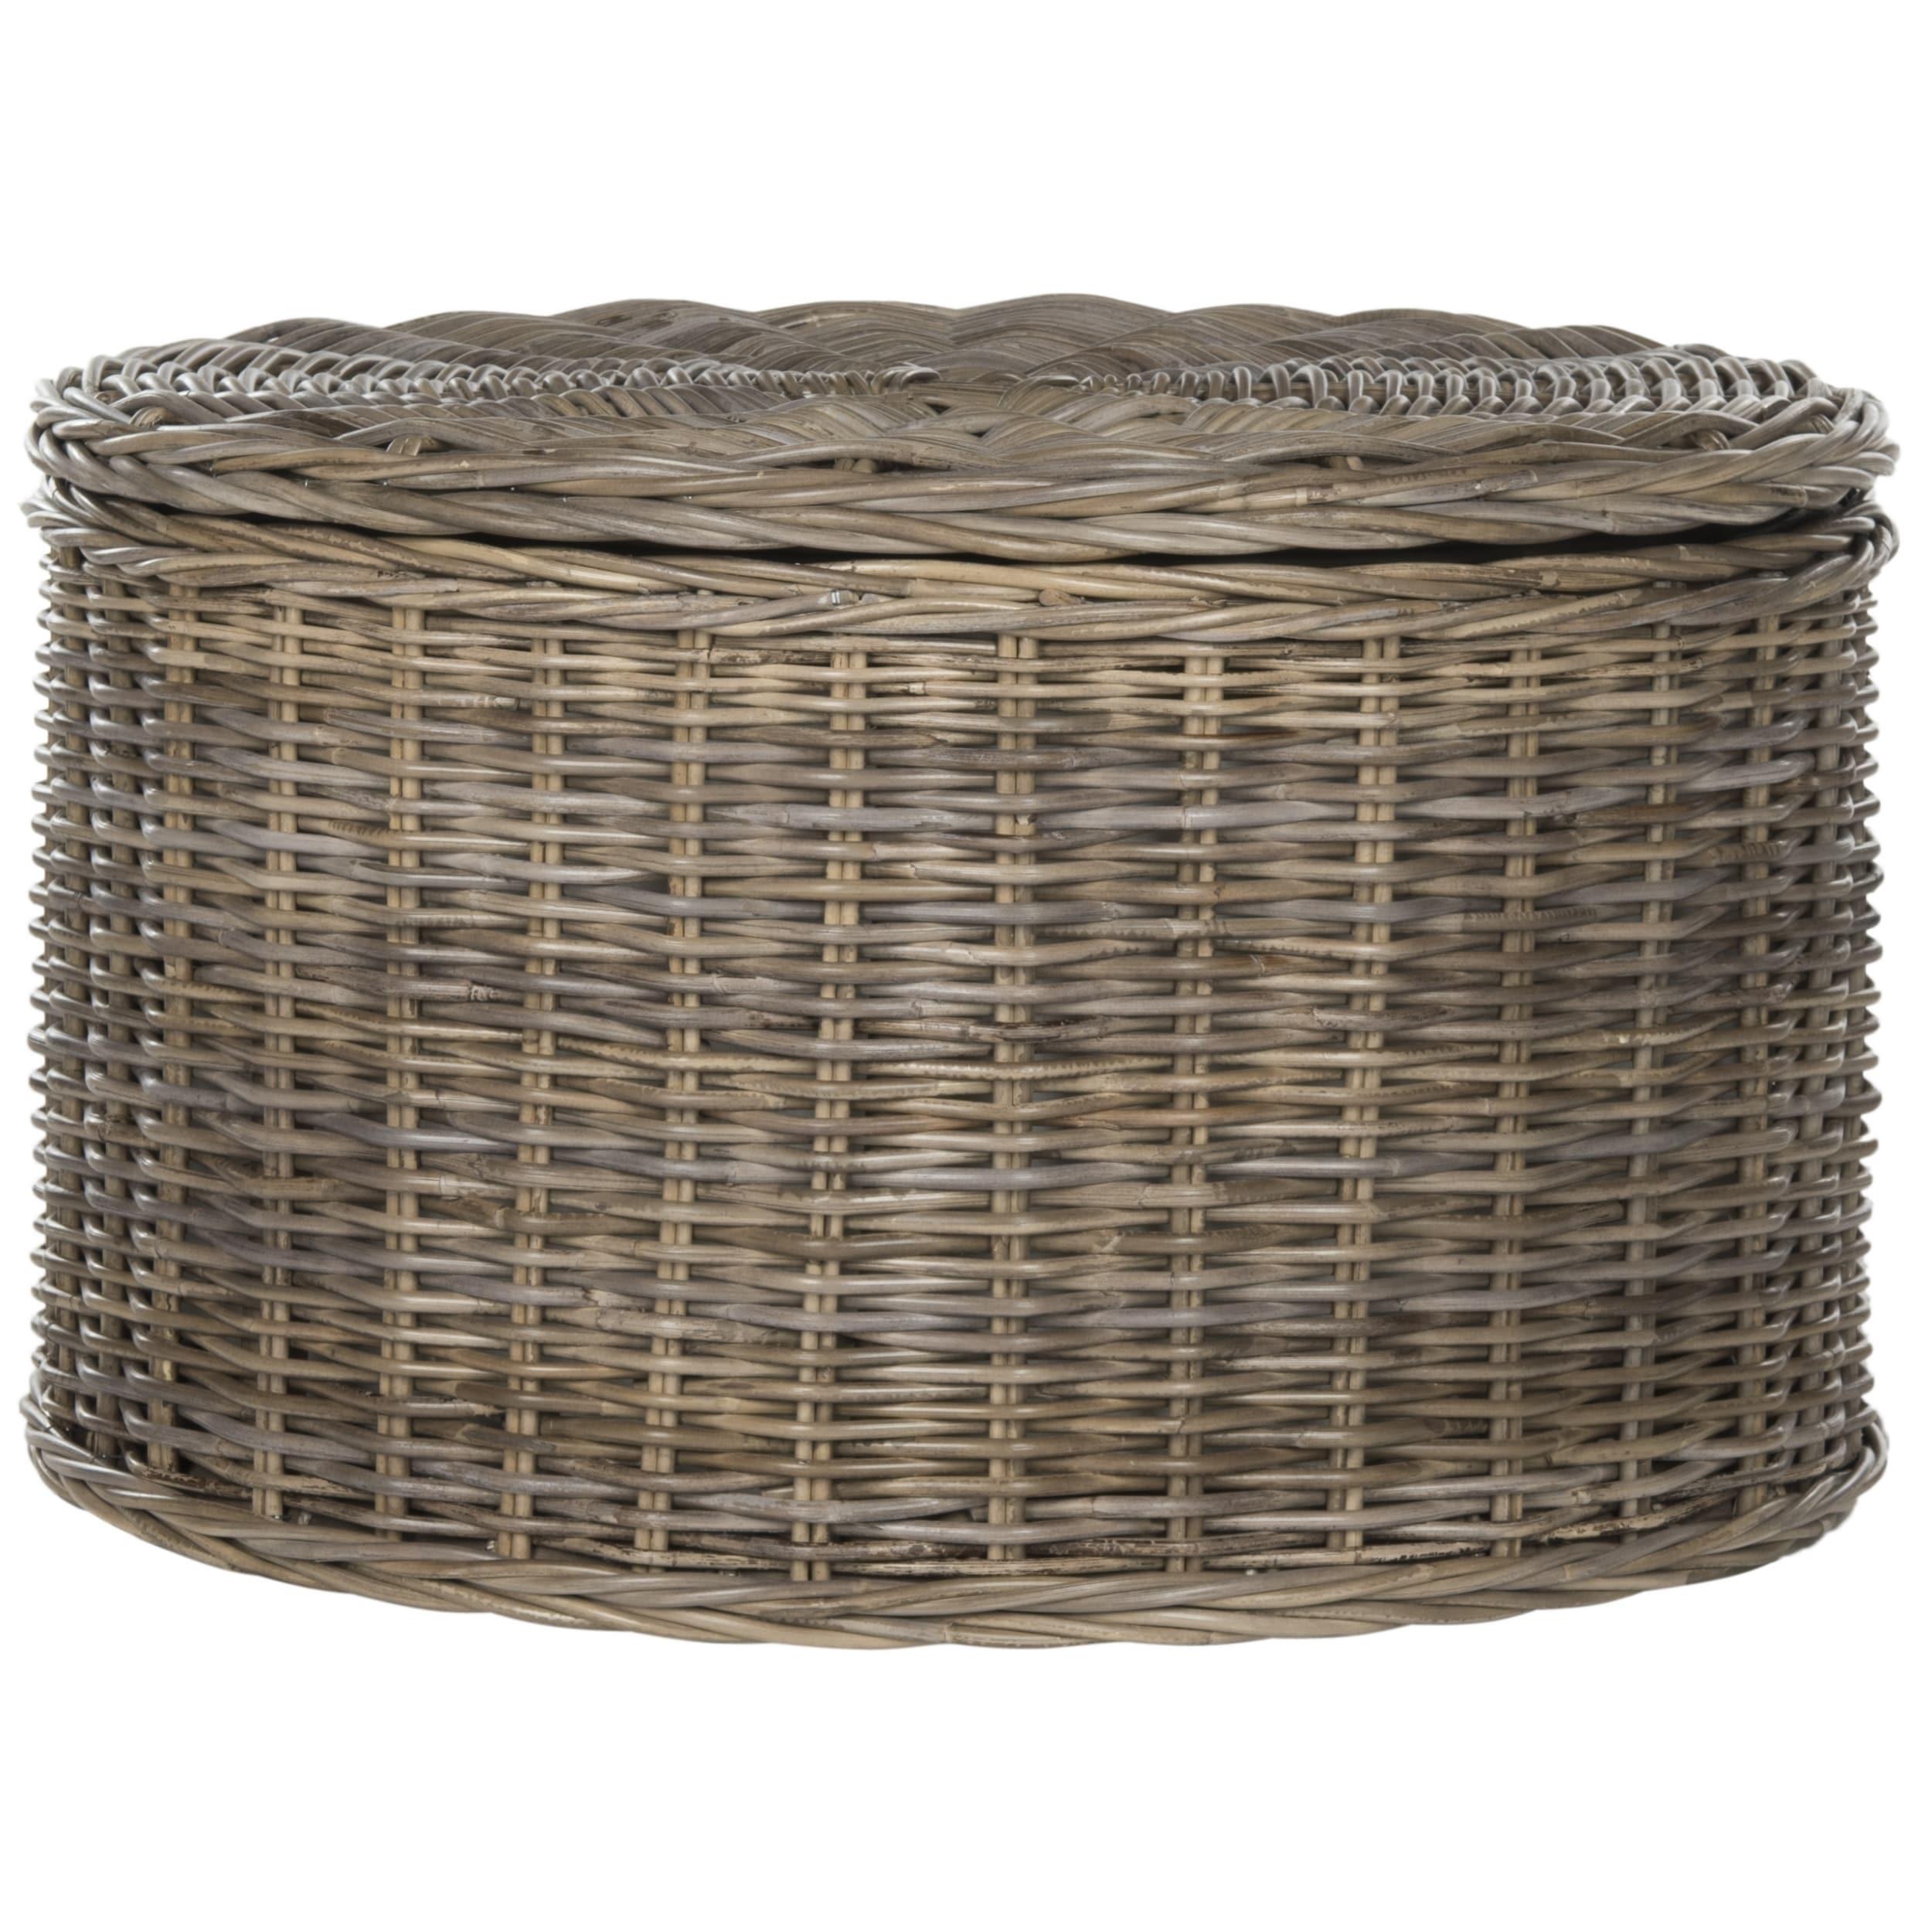 Safavieh Jesse Wicker Storage Coffee Table Free Shipping Today 13339502